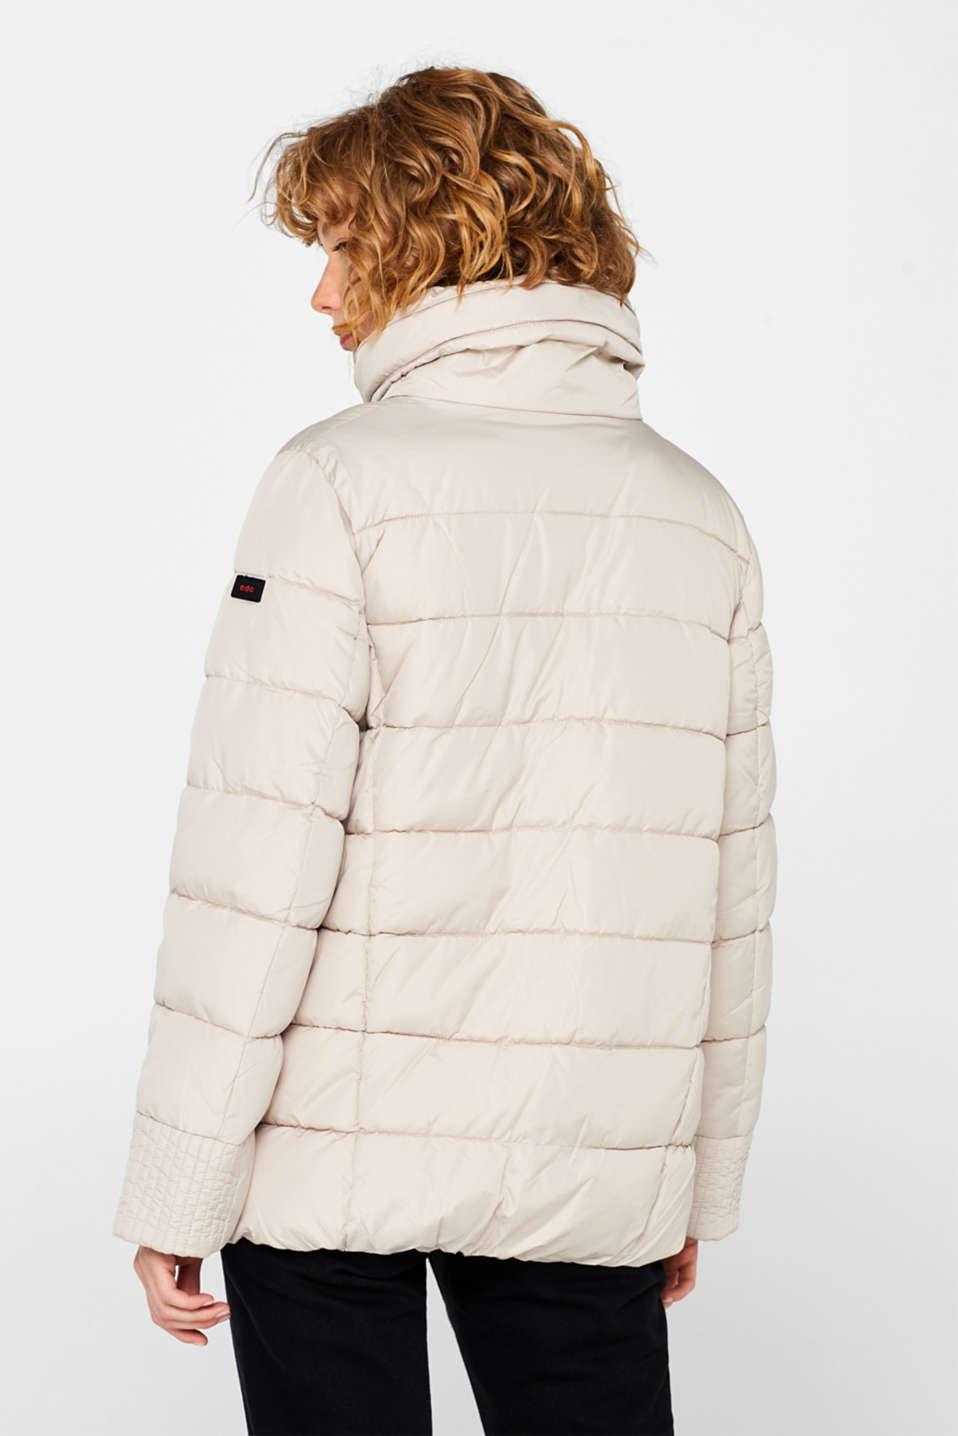 Jackets outdoor woven, LIGHT BEIGE, detail image number 3